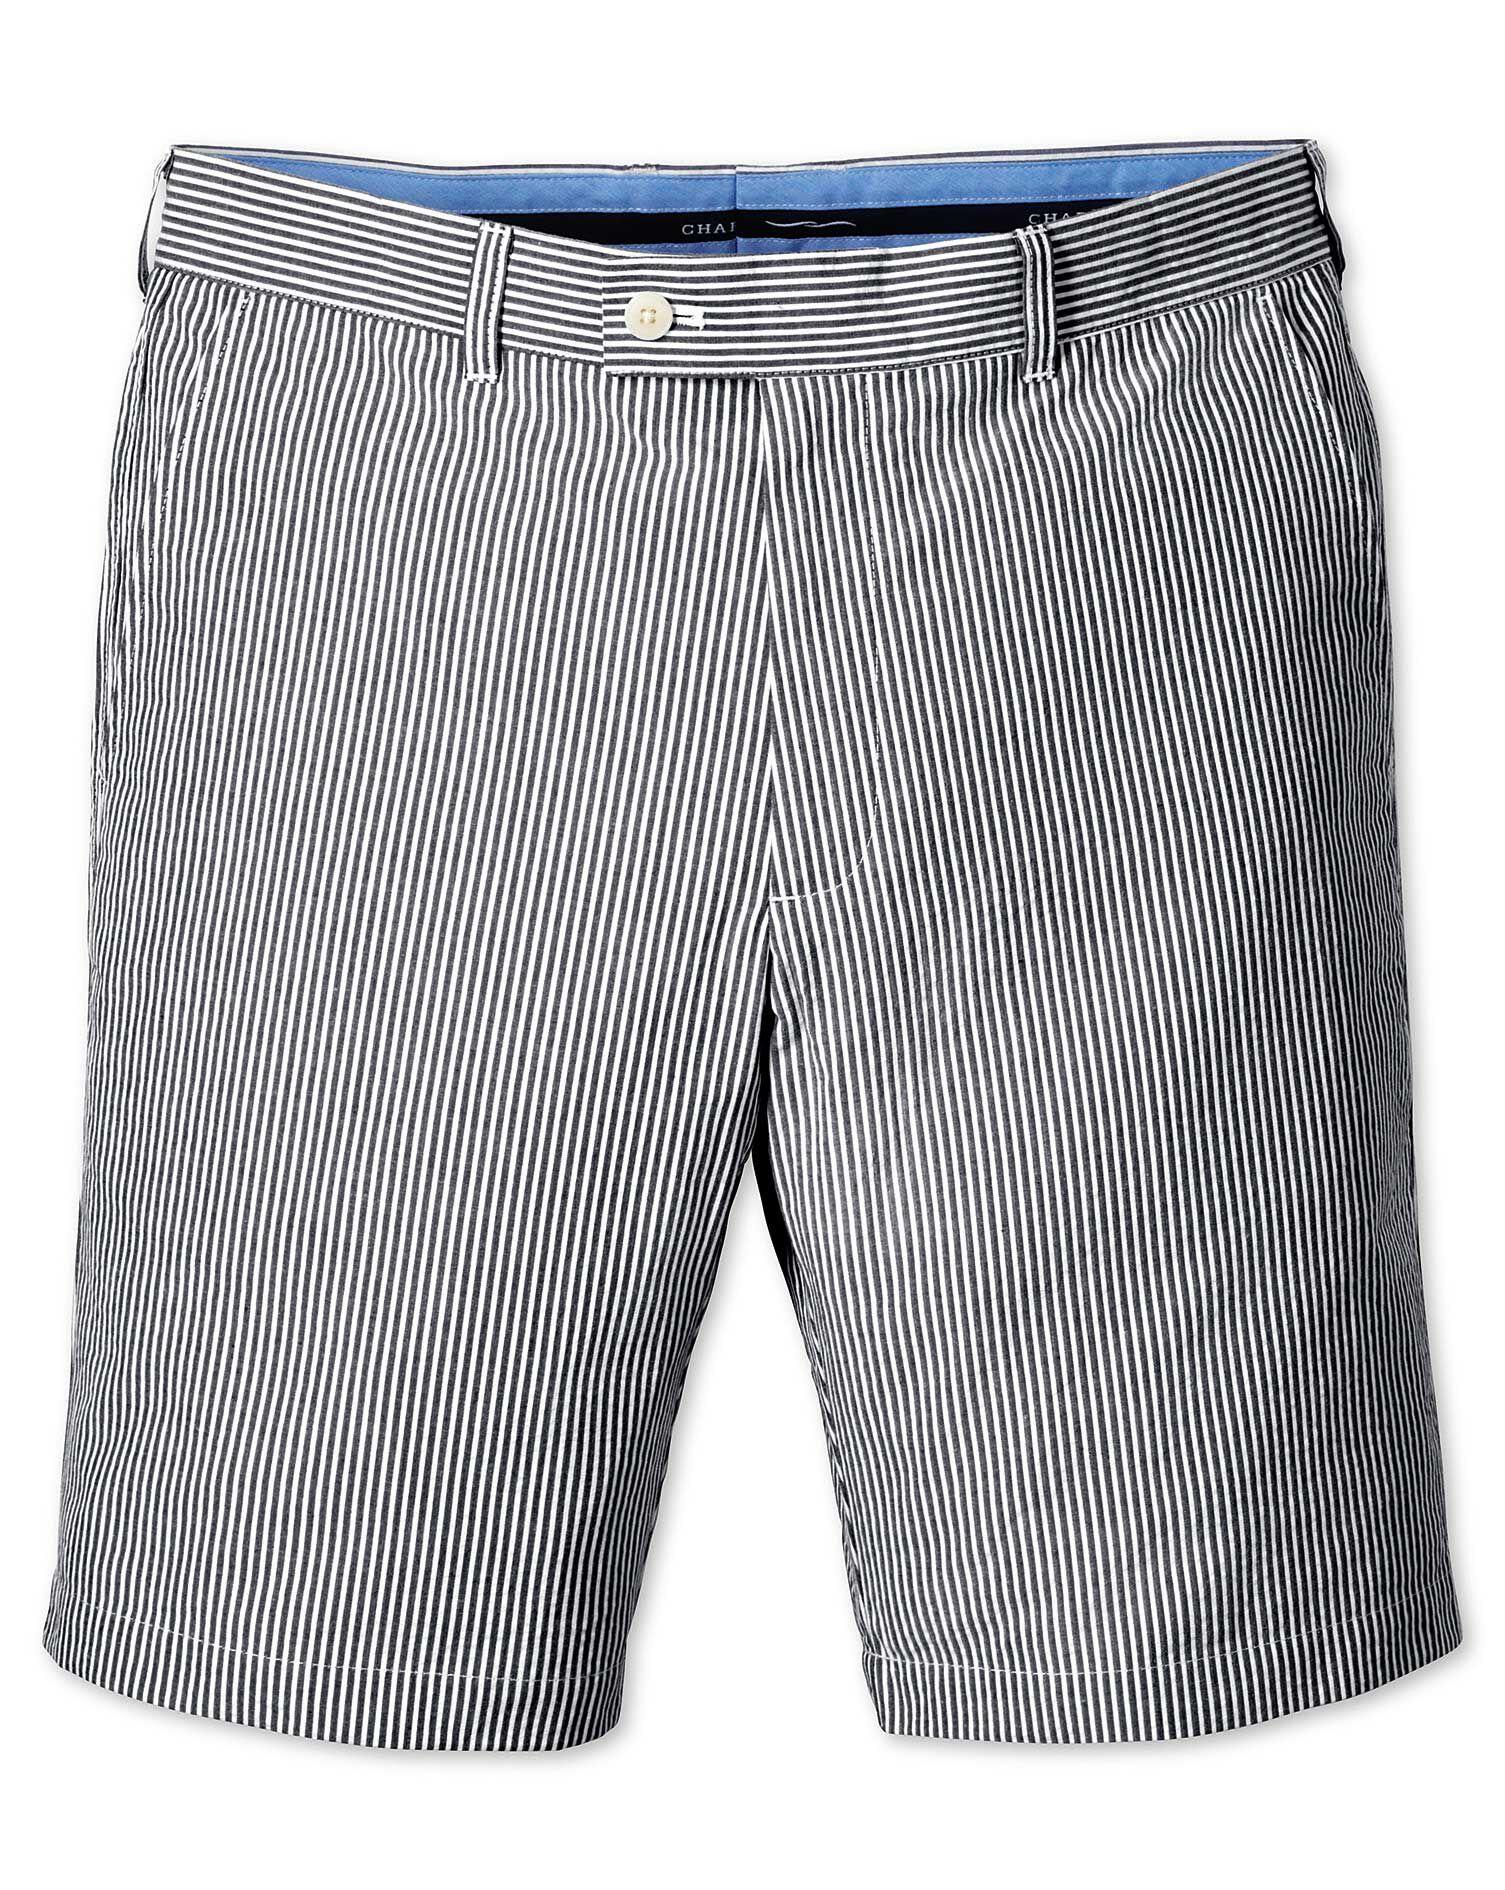 Blue Slim Fit Seersucker Stripe Cotton Shorts Size 38 by Charles Tyrwhitt